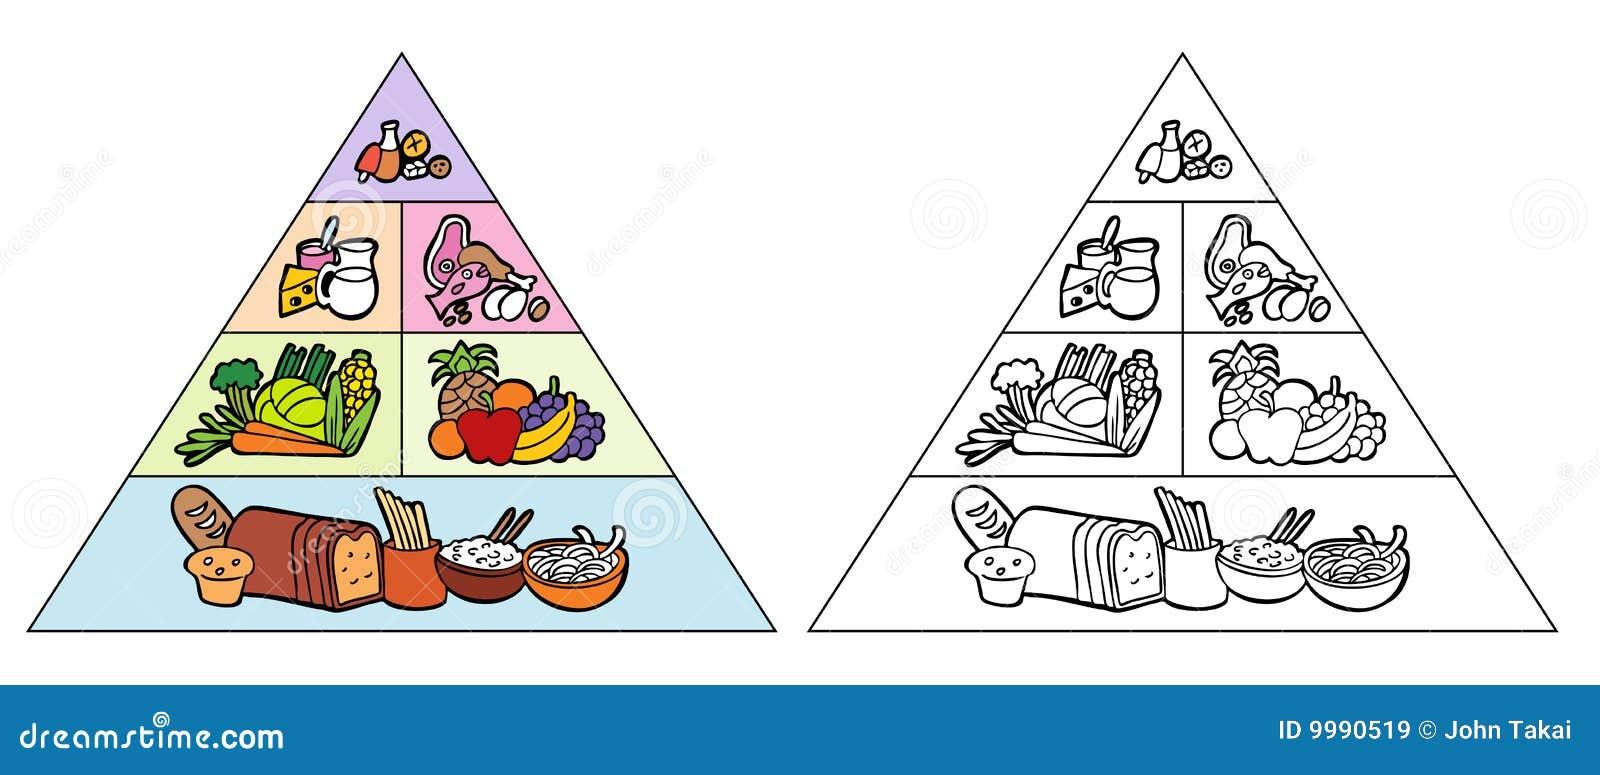 Food Pyramid - Cartoon Royalty Free Stock Images - Image ...